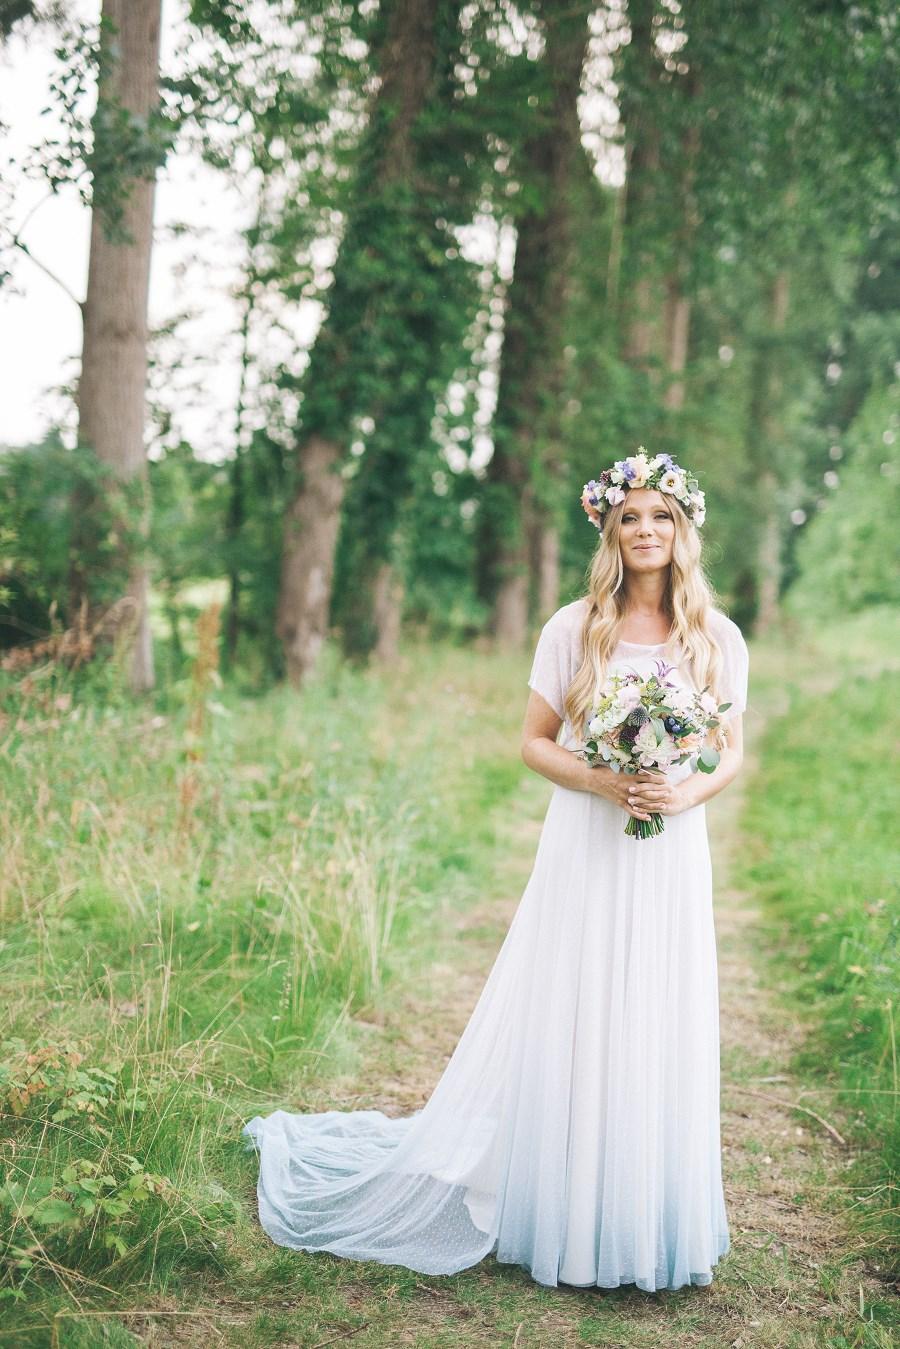 Lovetralala_shooting d'inspiration kiss the bride_25